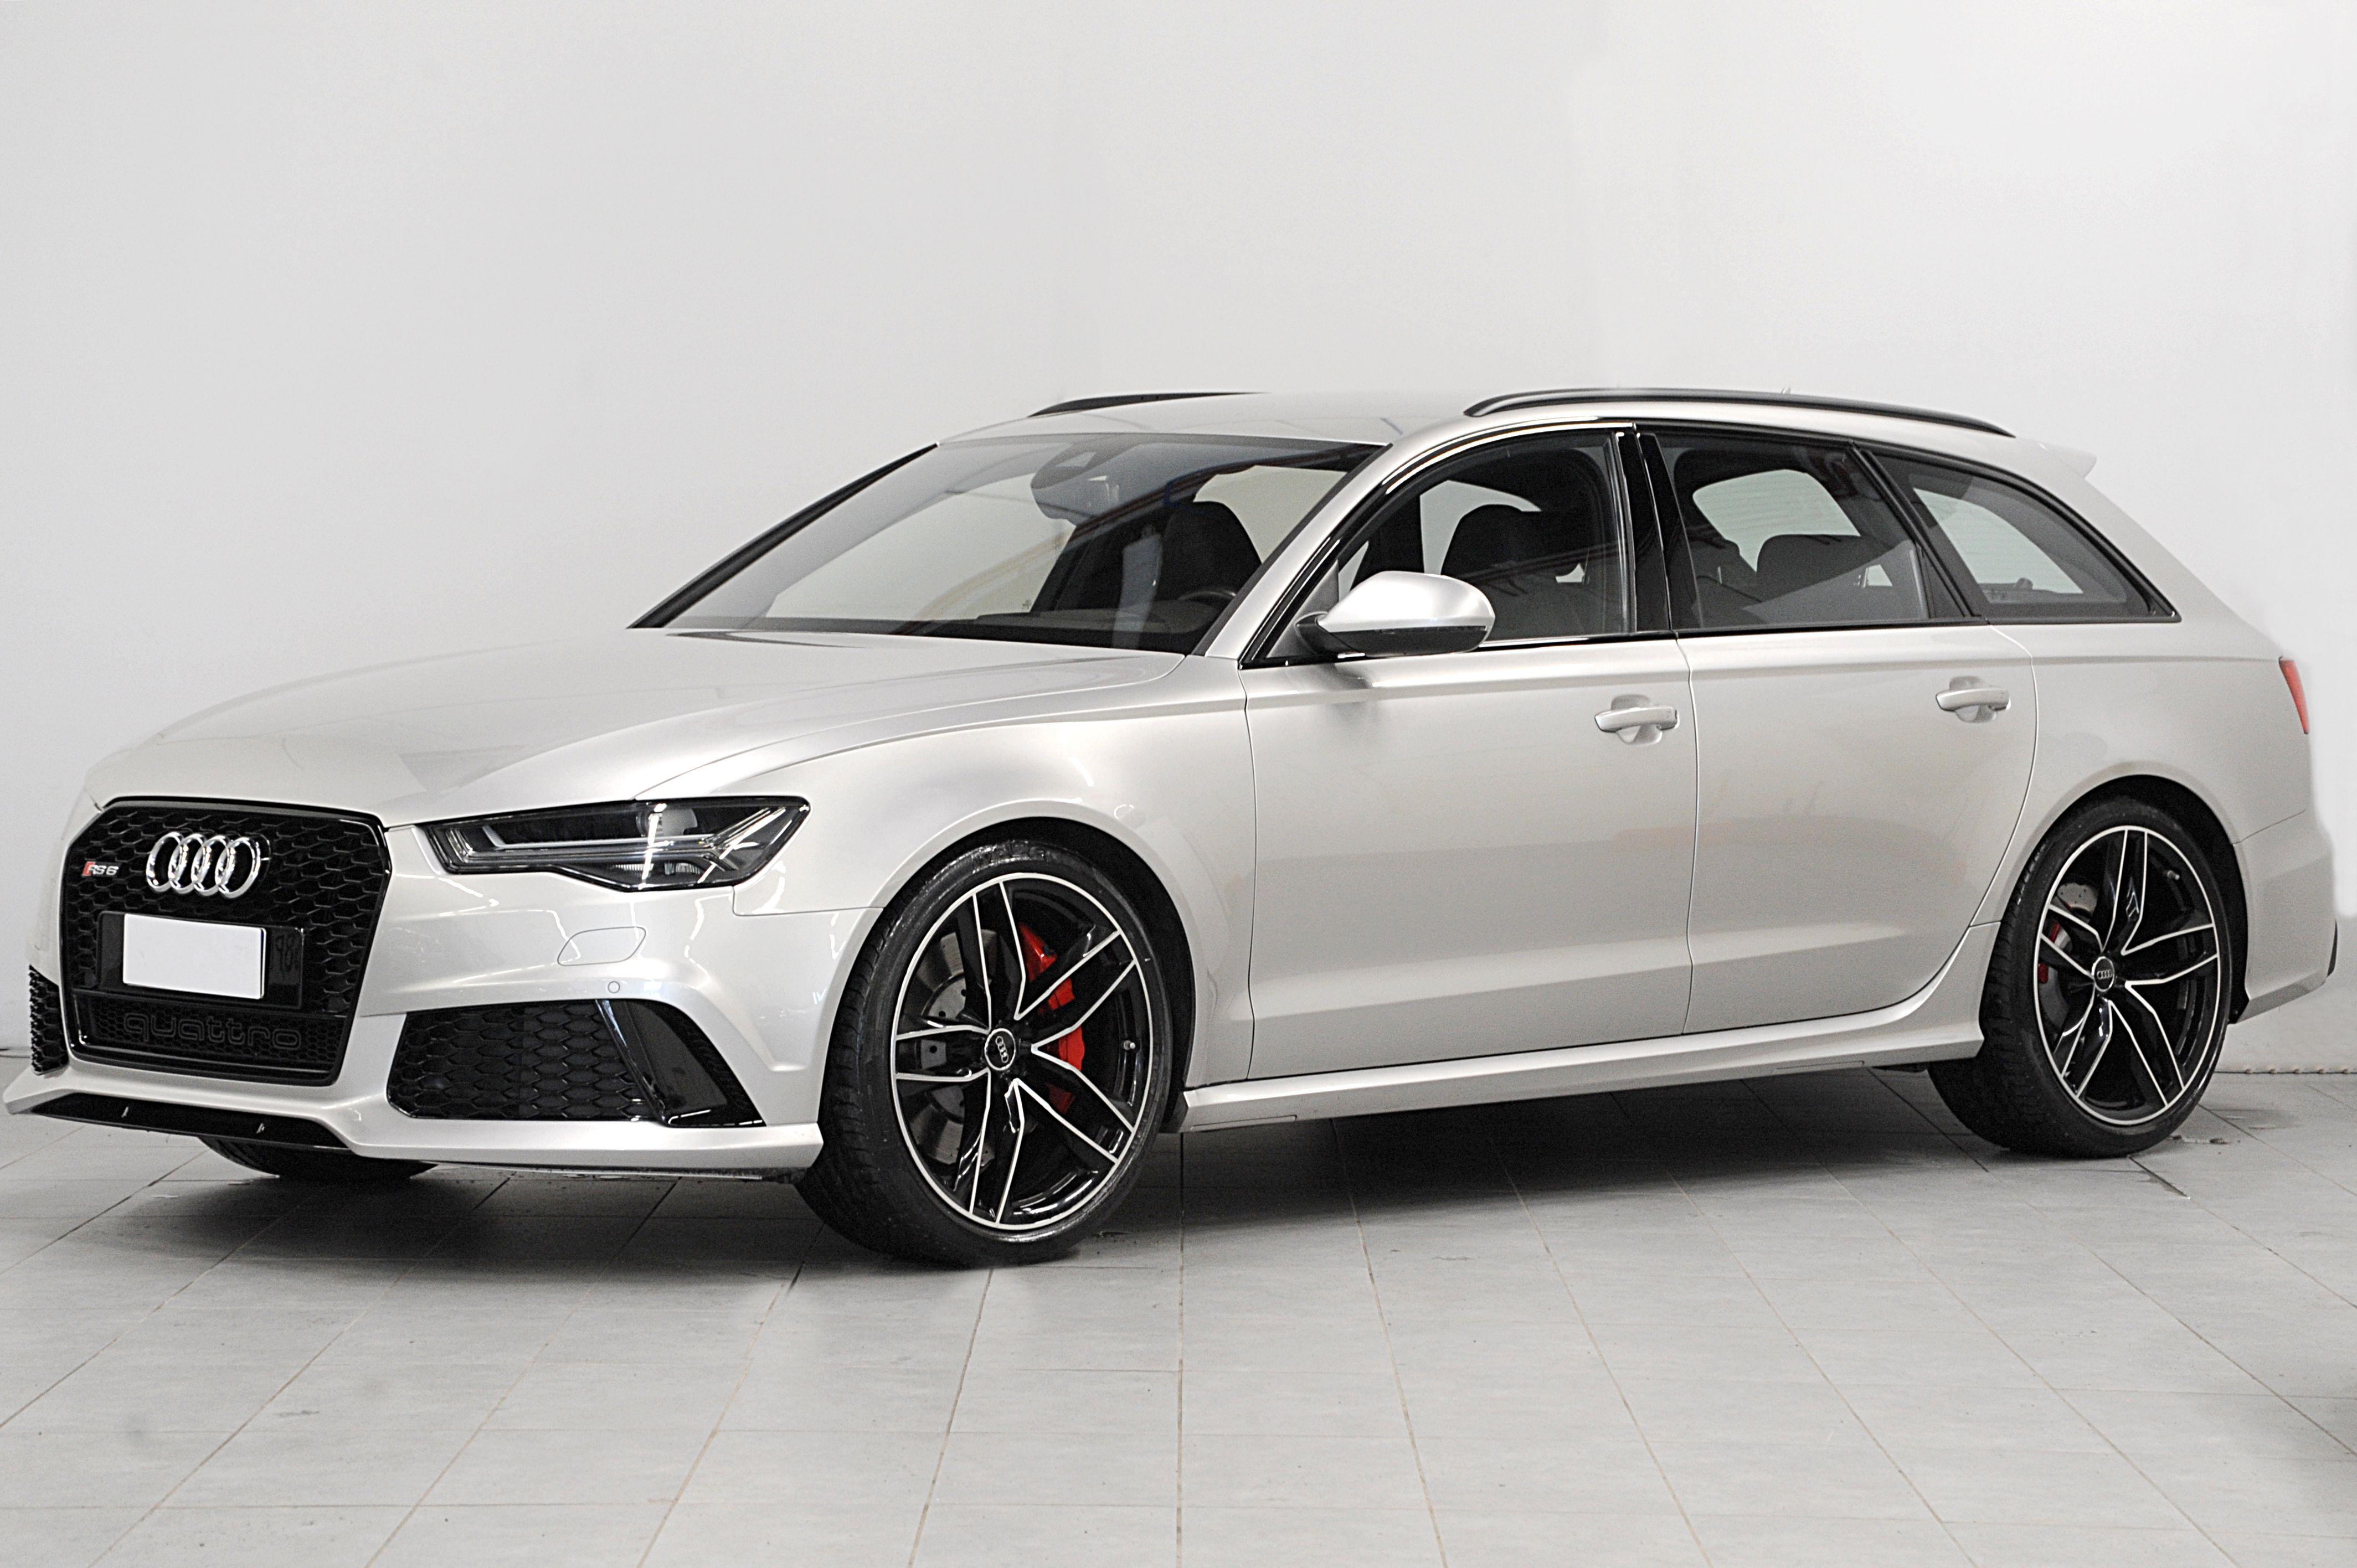 Audi RS6 Avant 4.0 TFSI quattro Tiptronic con 67800 km del